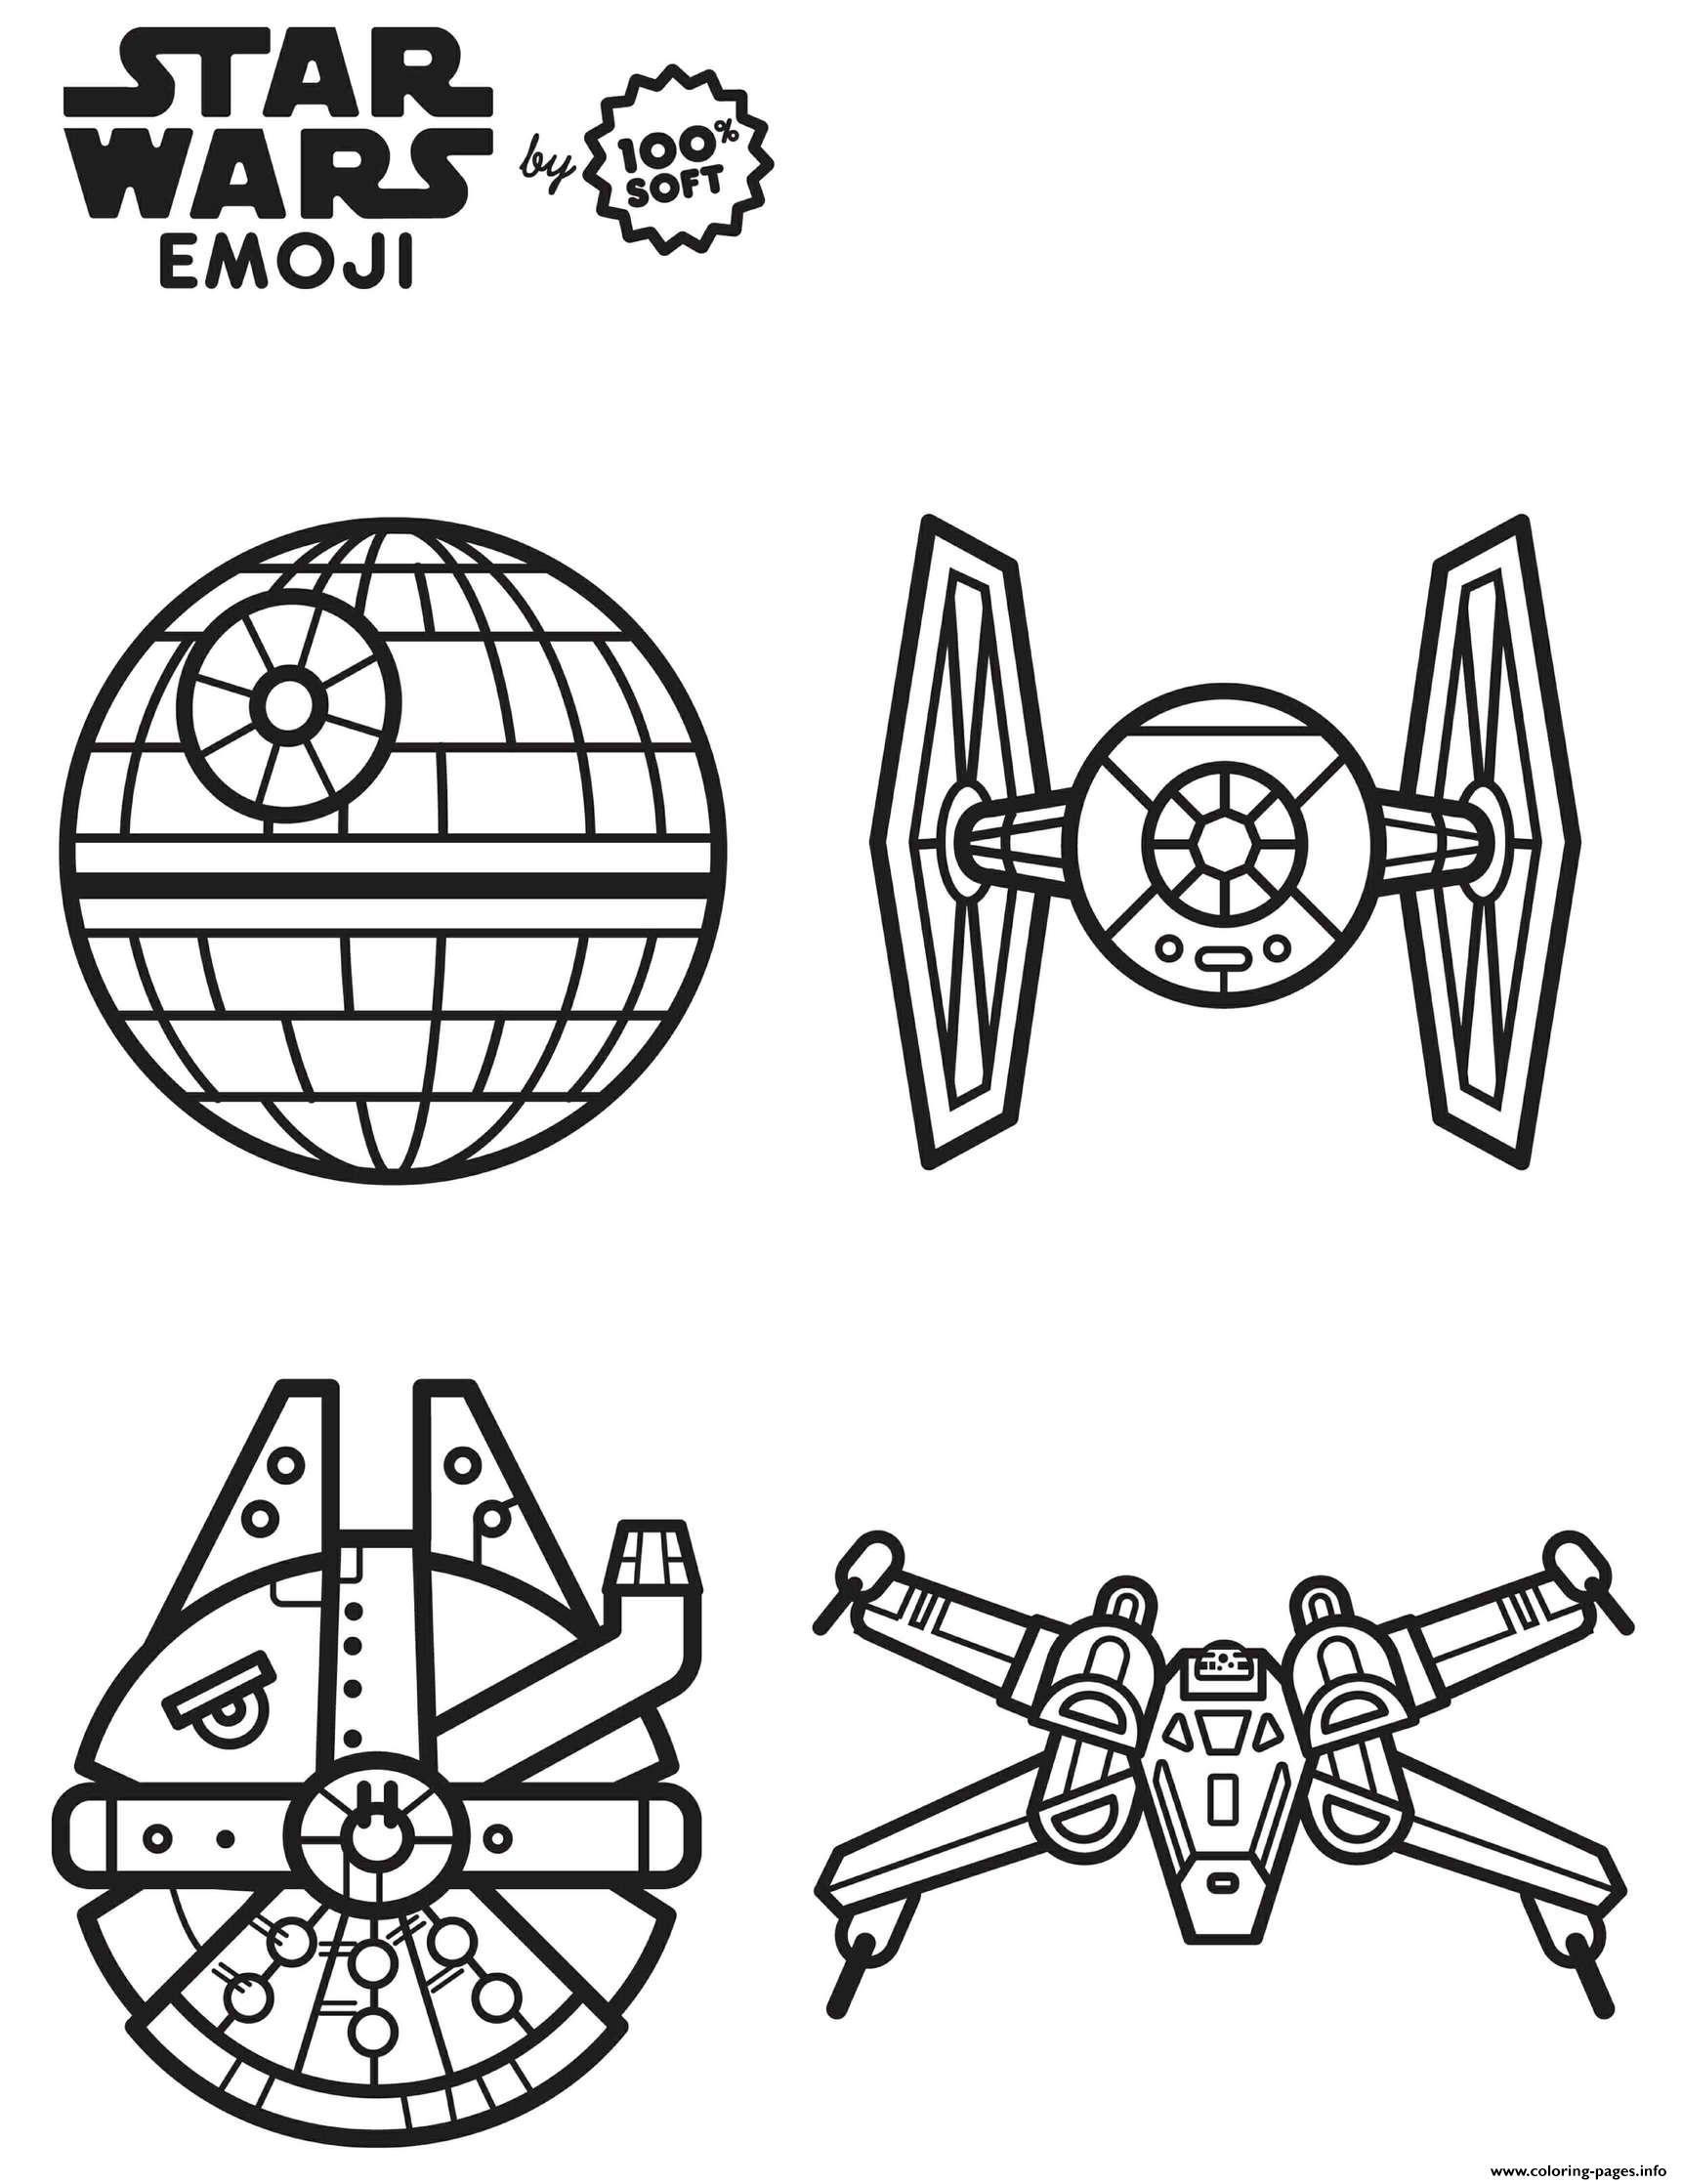 Death Star Stencil Jpg 1100 850 Star Wars Stencil Star Wars Pumpkins Star Coloring Pages